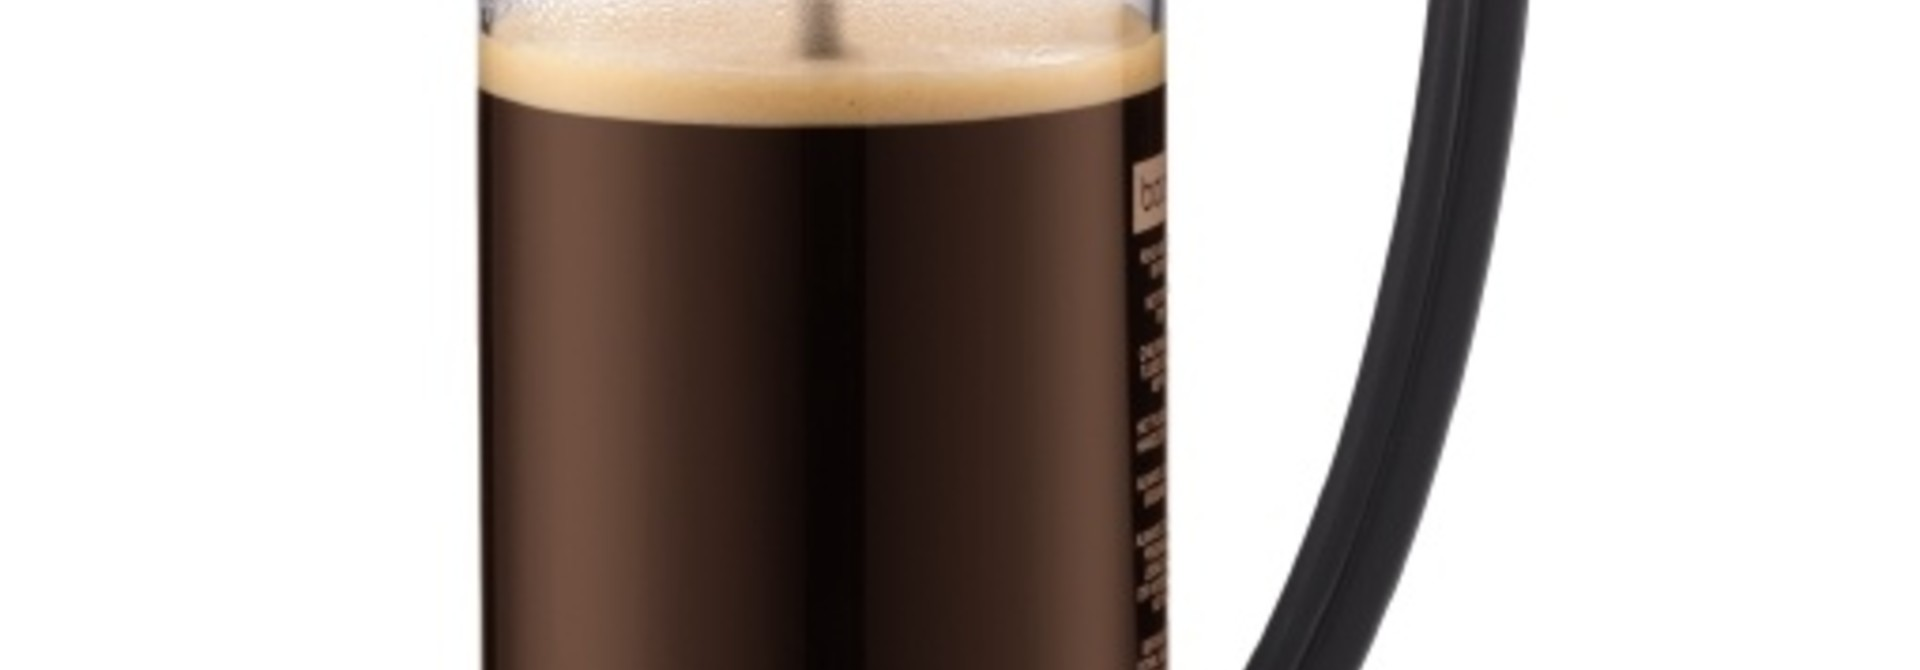 Bodum Brazil cafétière 350ml